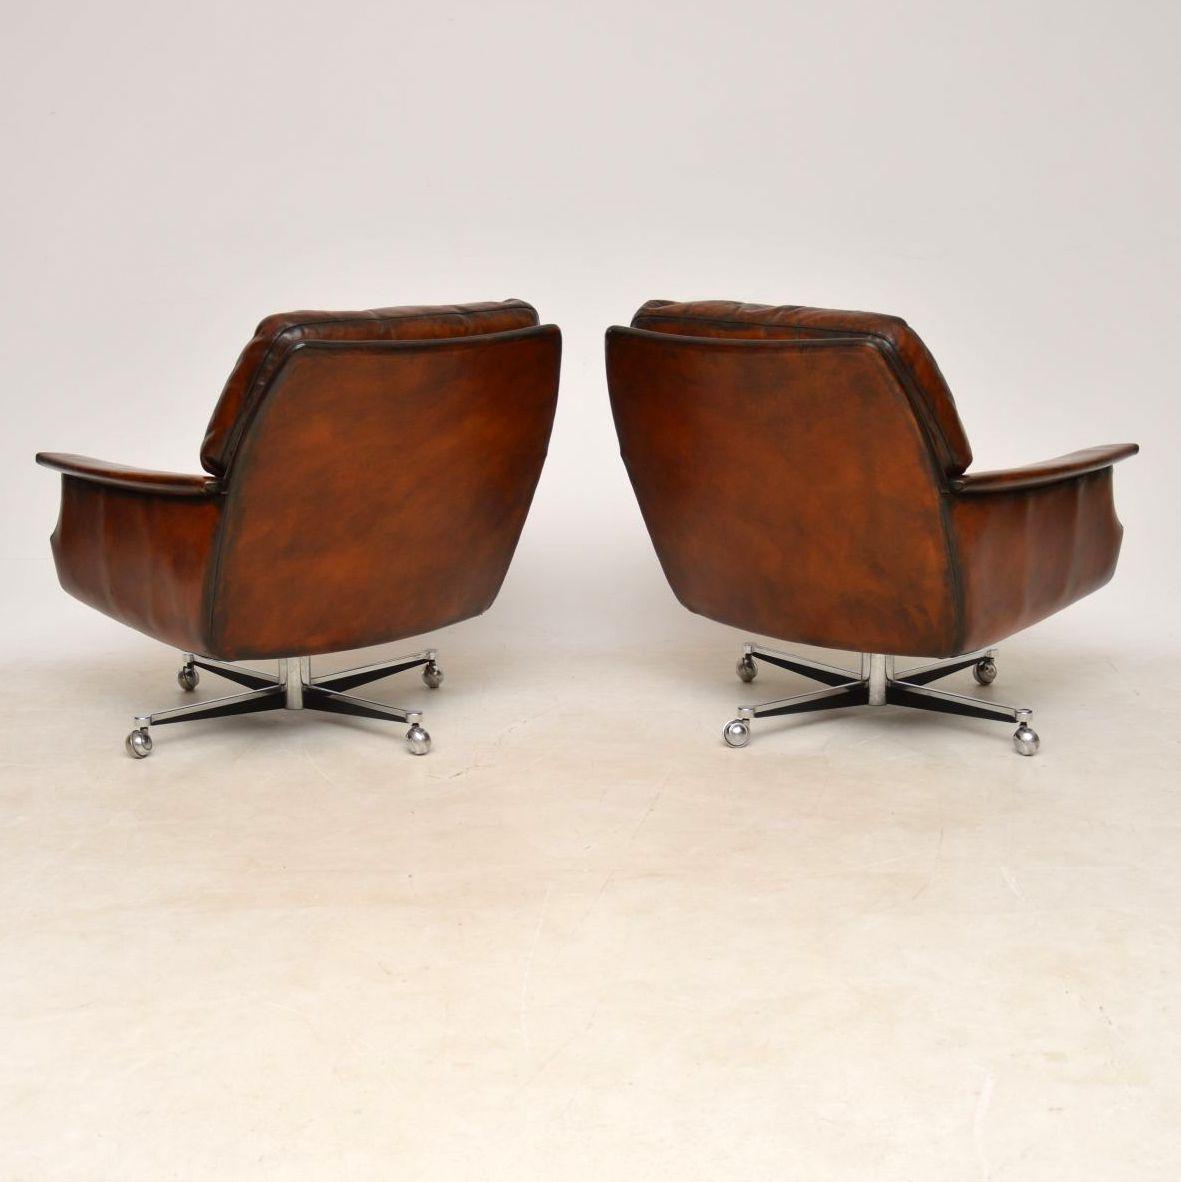 pair_danish_leather_chrome_swivel_armchairs_6